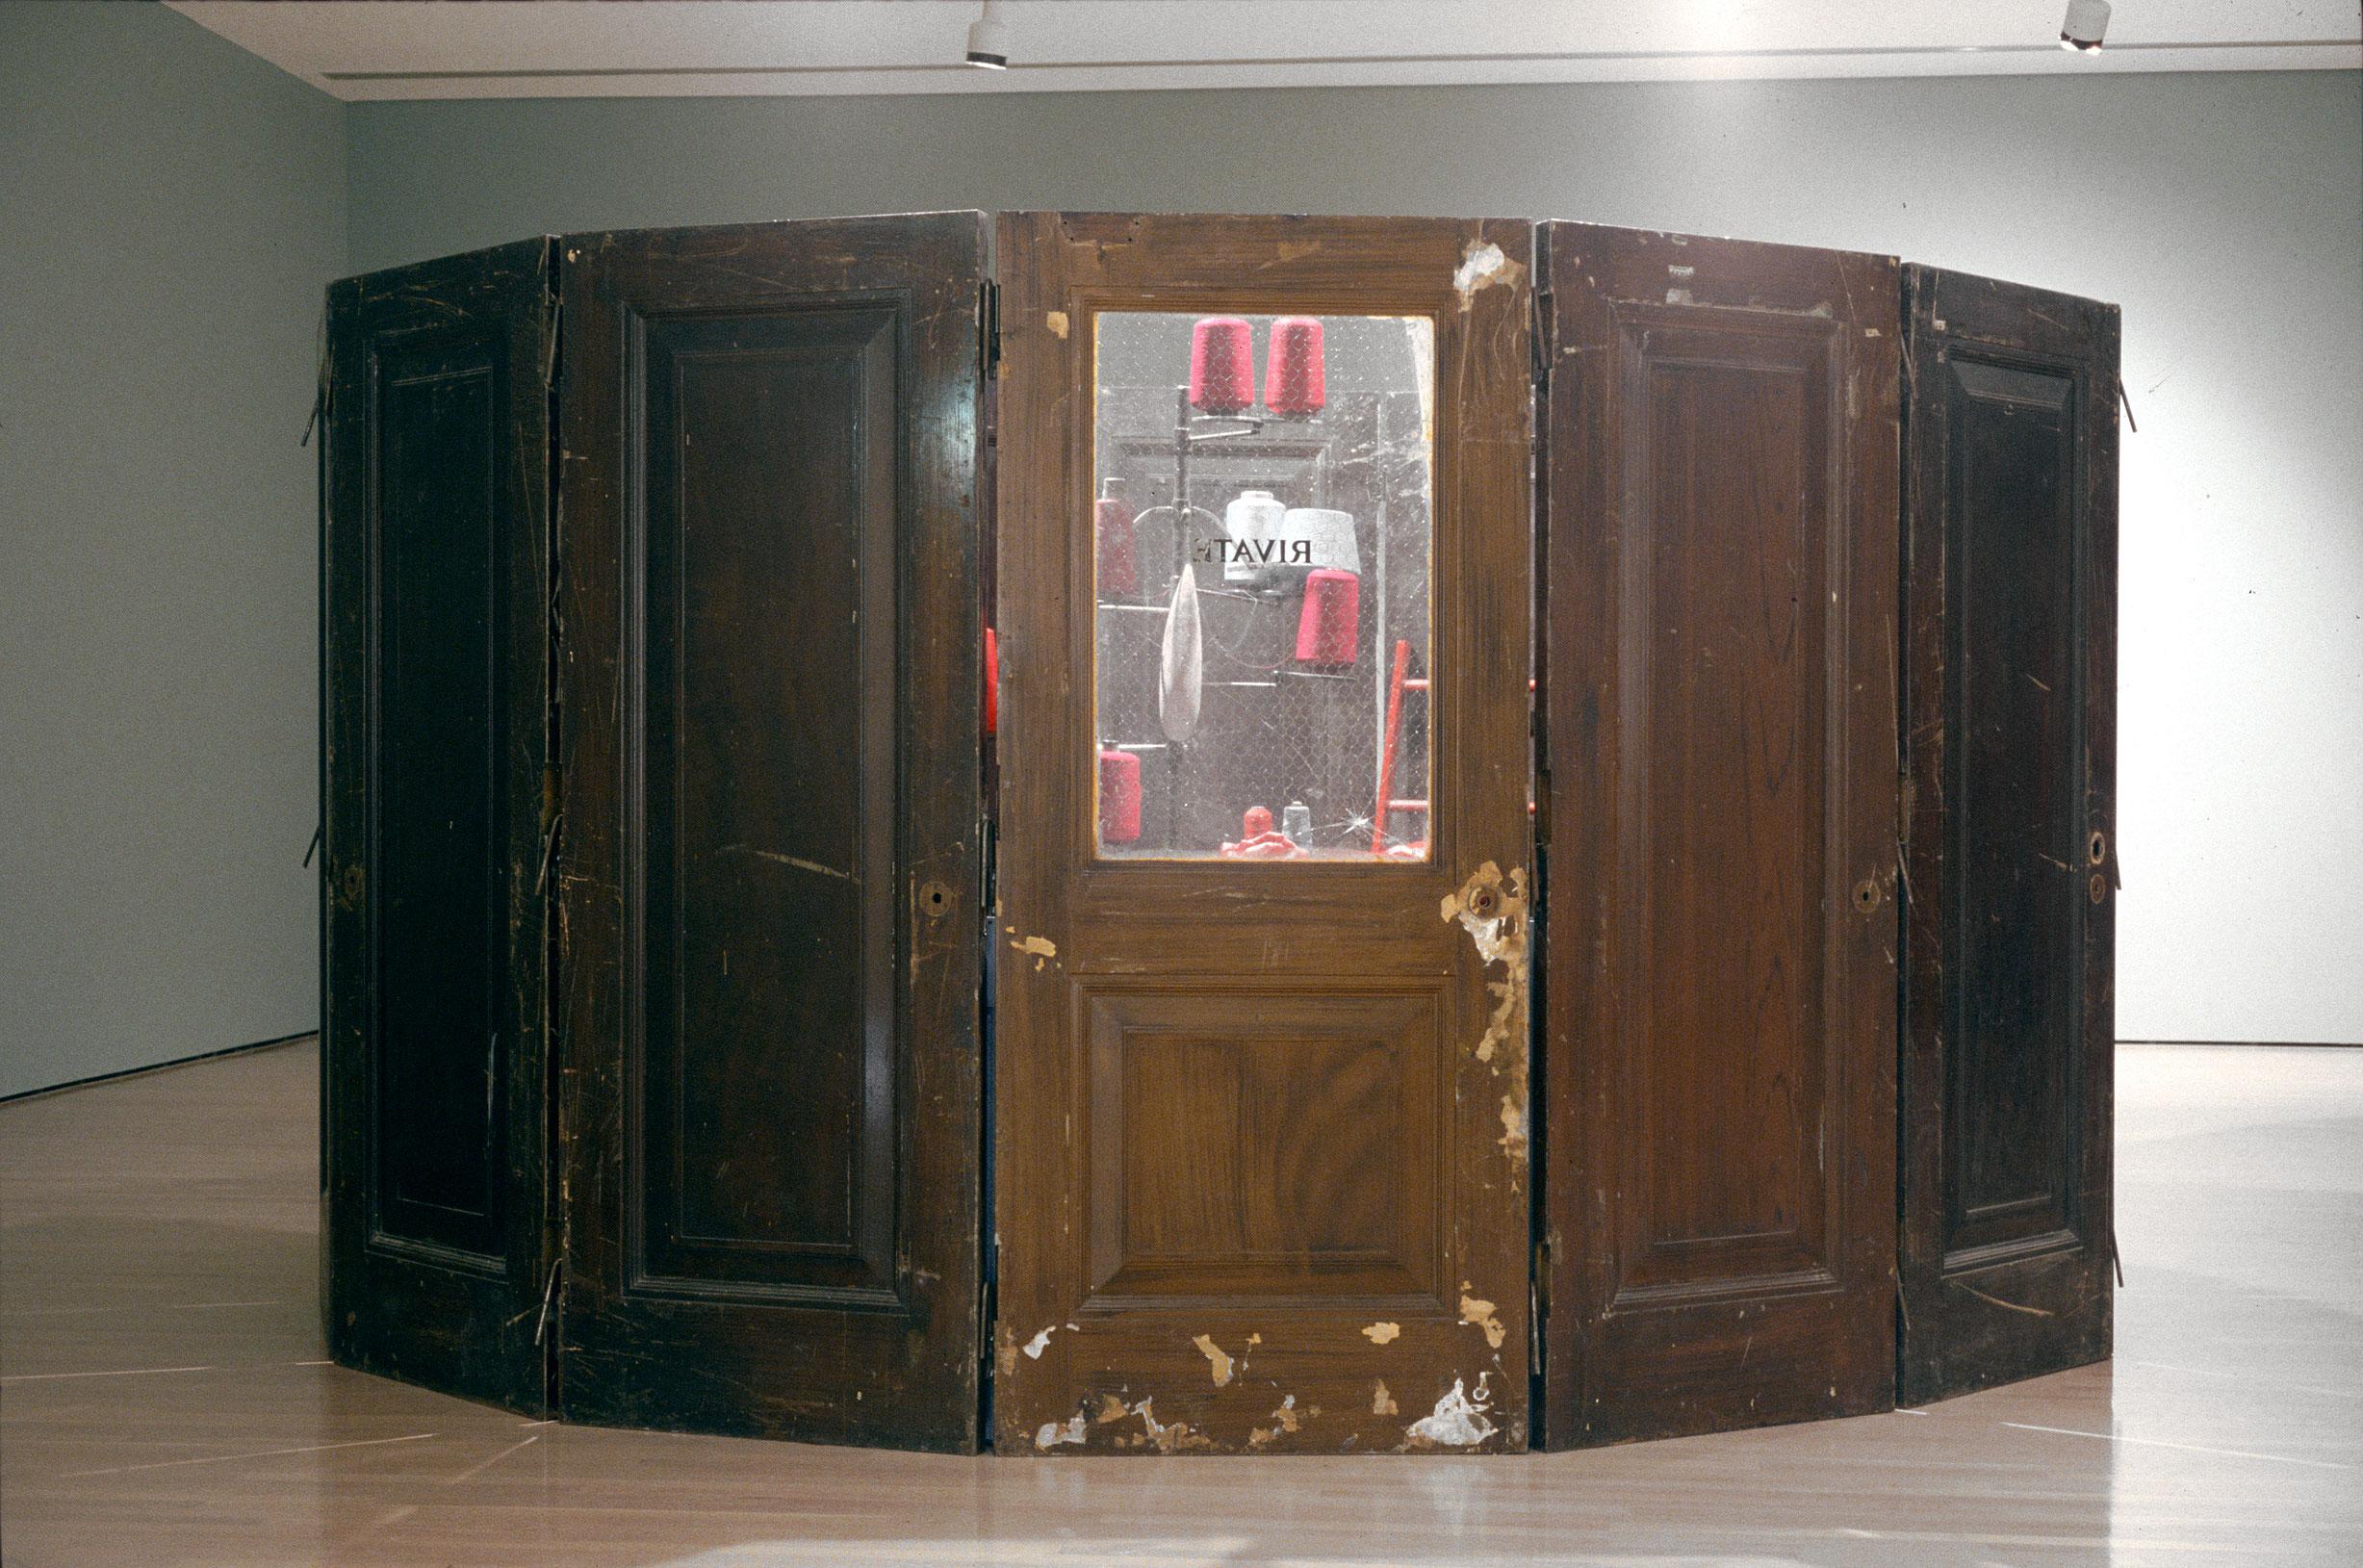 The Red Room - Child, 1994, Louise Bourgeois, Bois, métal, fil, verre et cire.